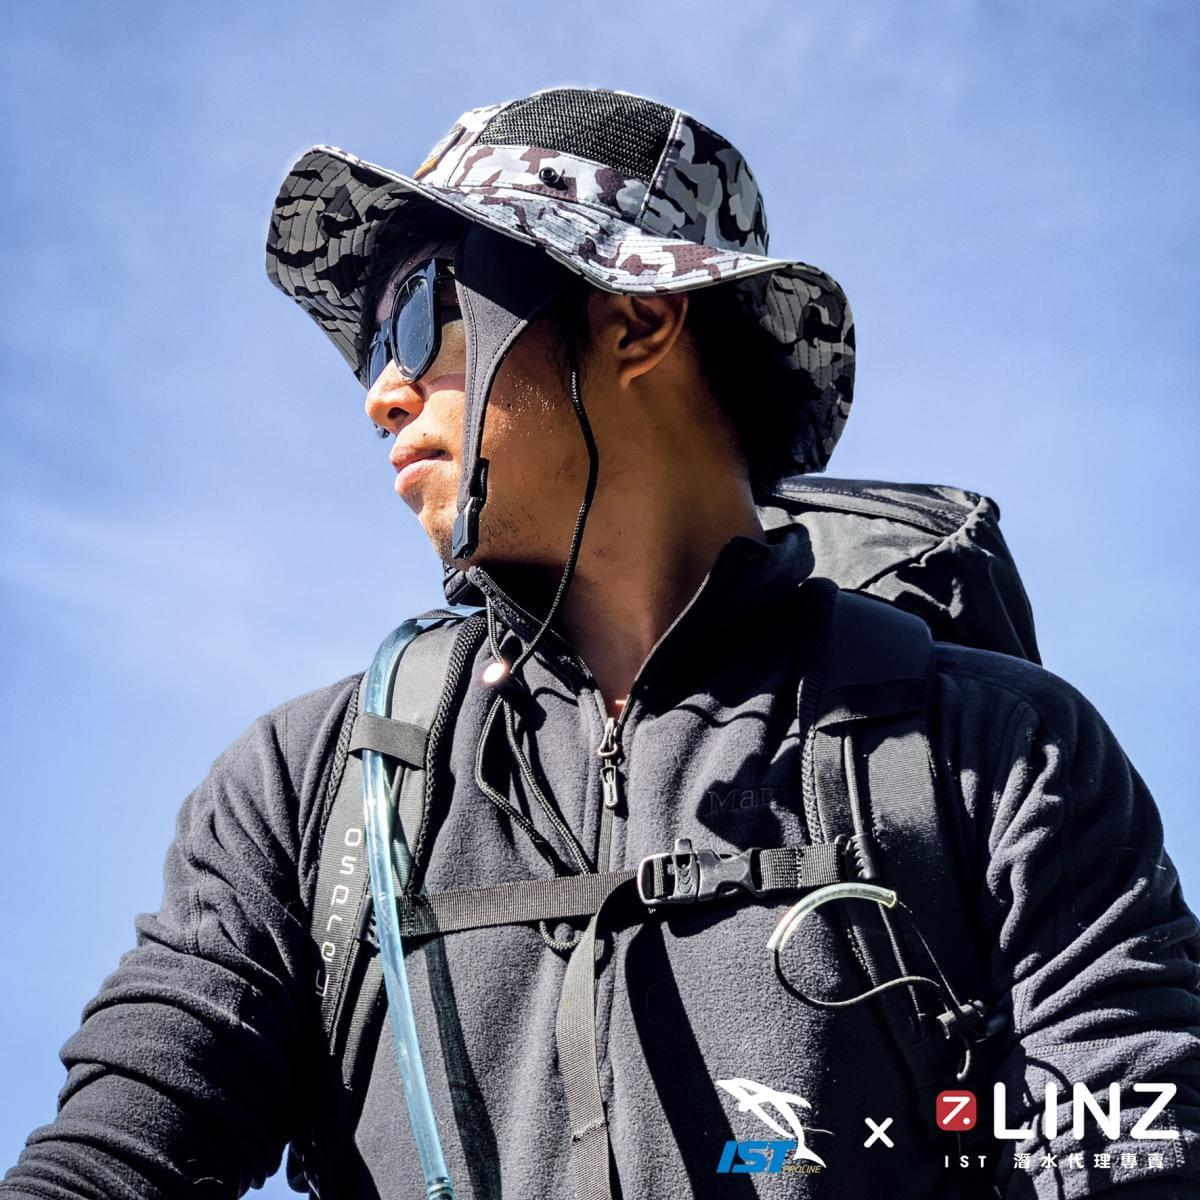 【IST】MIT 漁夫帽 衝浪帽 潛水 自潛 衝浪 溯溪 SUP 5